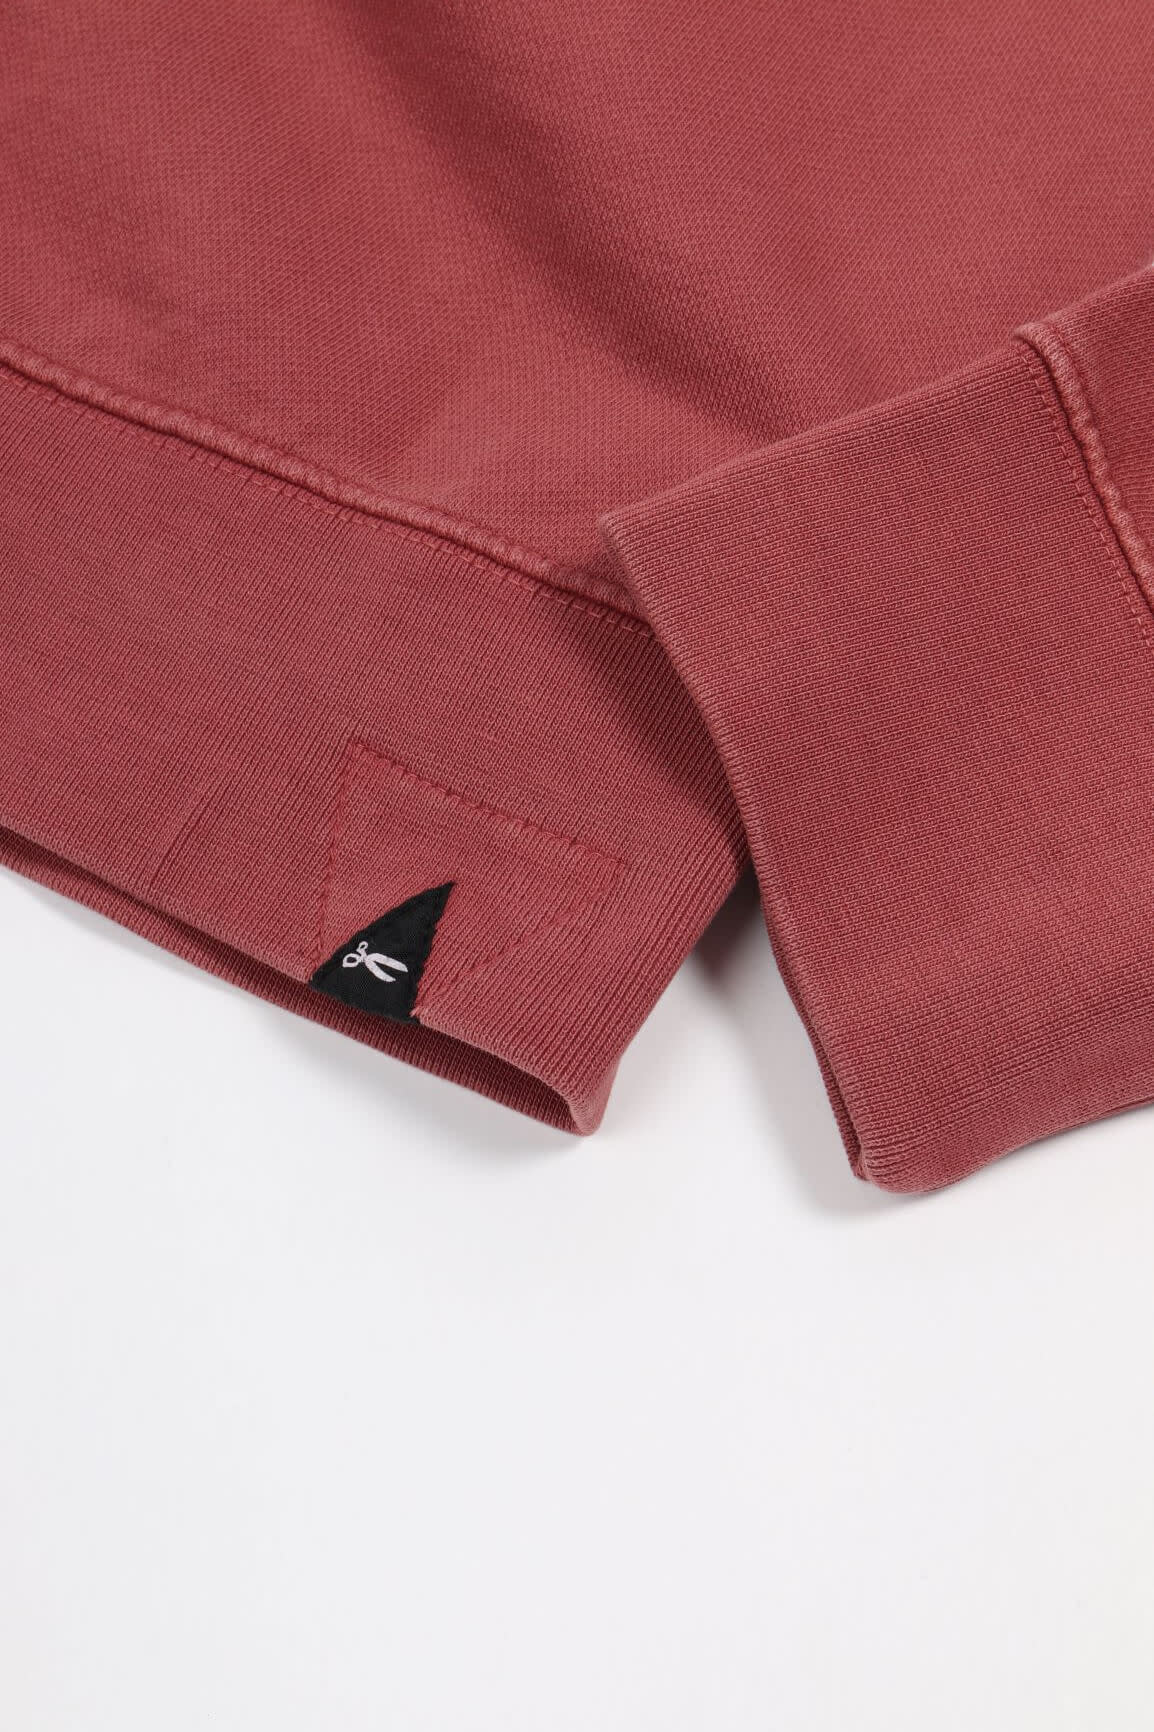 Applique Sweater marsala red-2